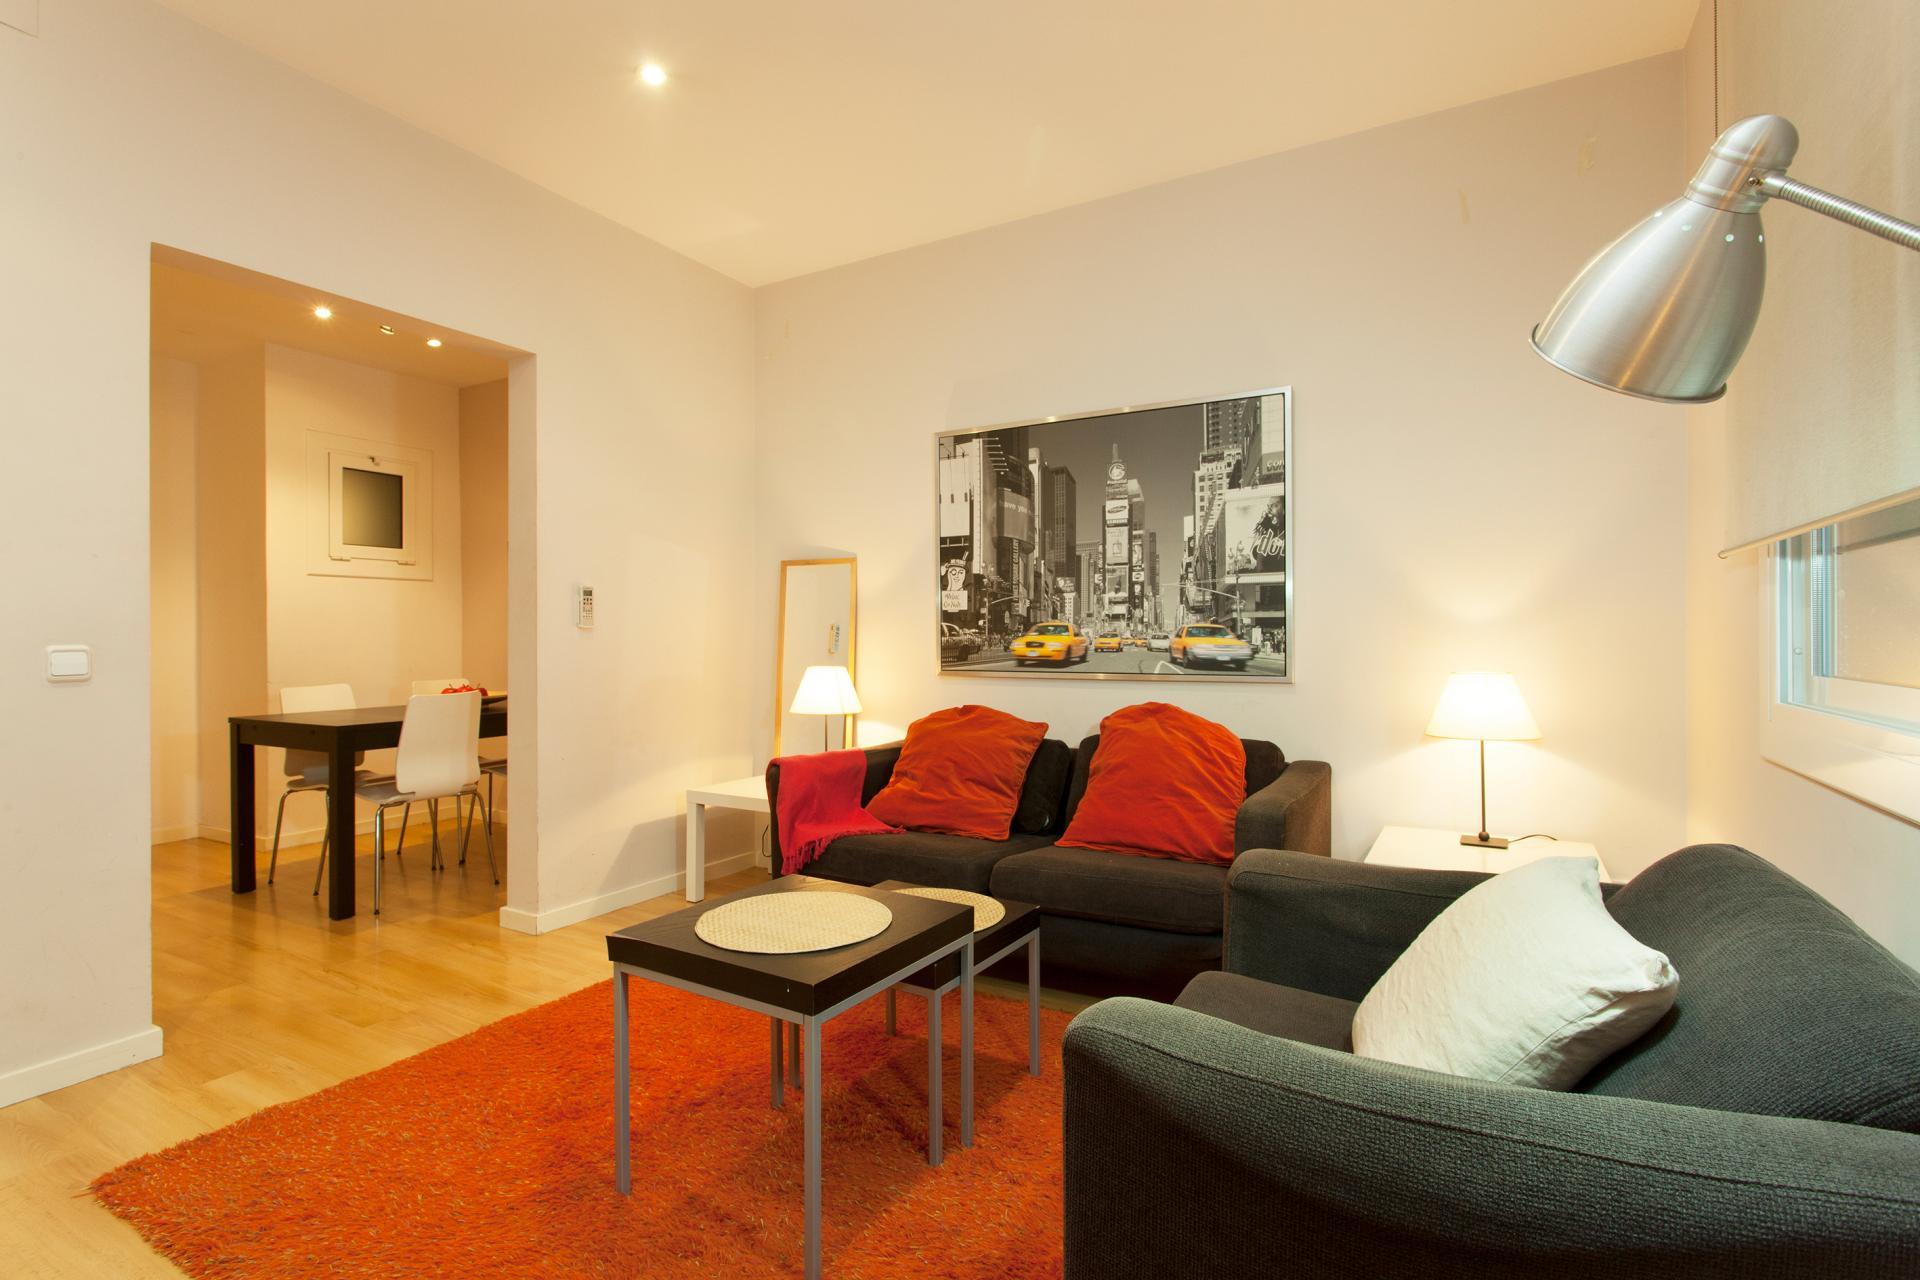 Wohnung zur Miete in Barcelona València - Lepant